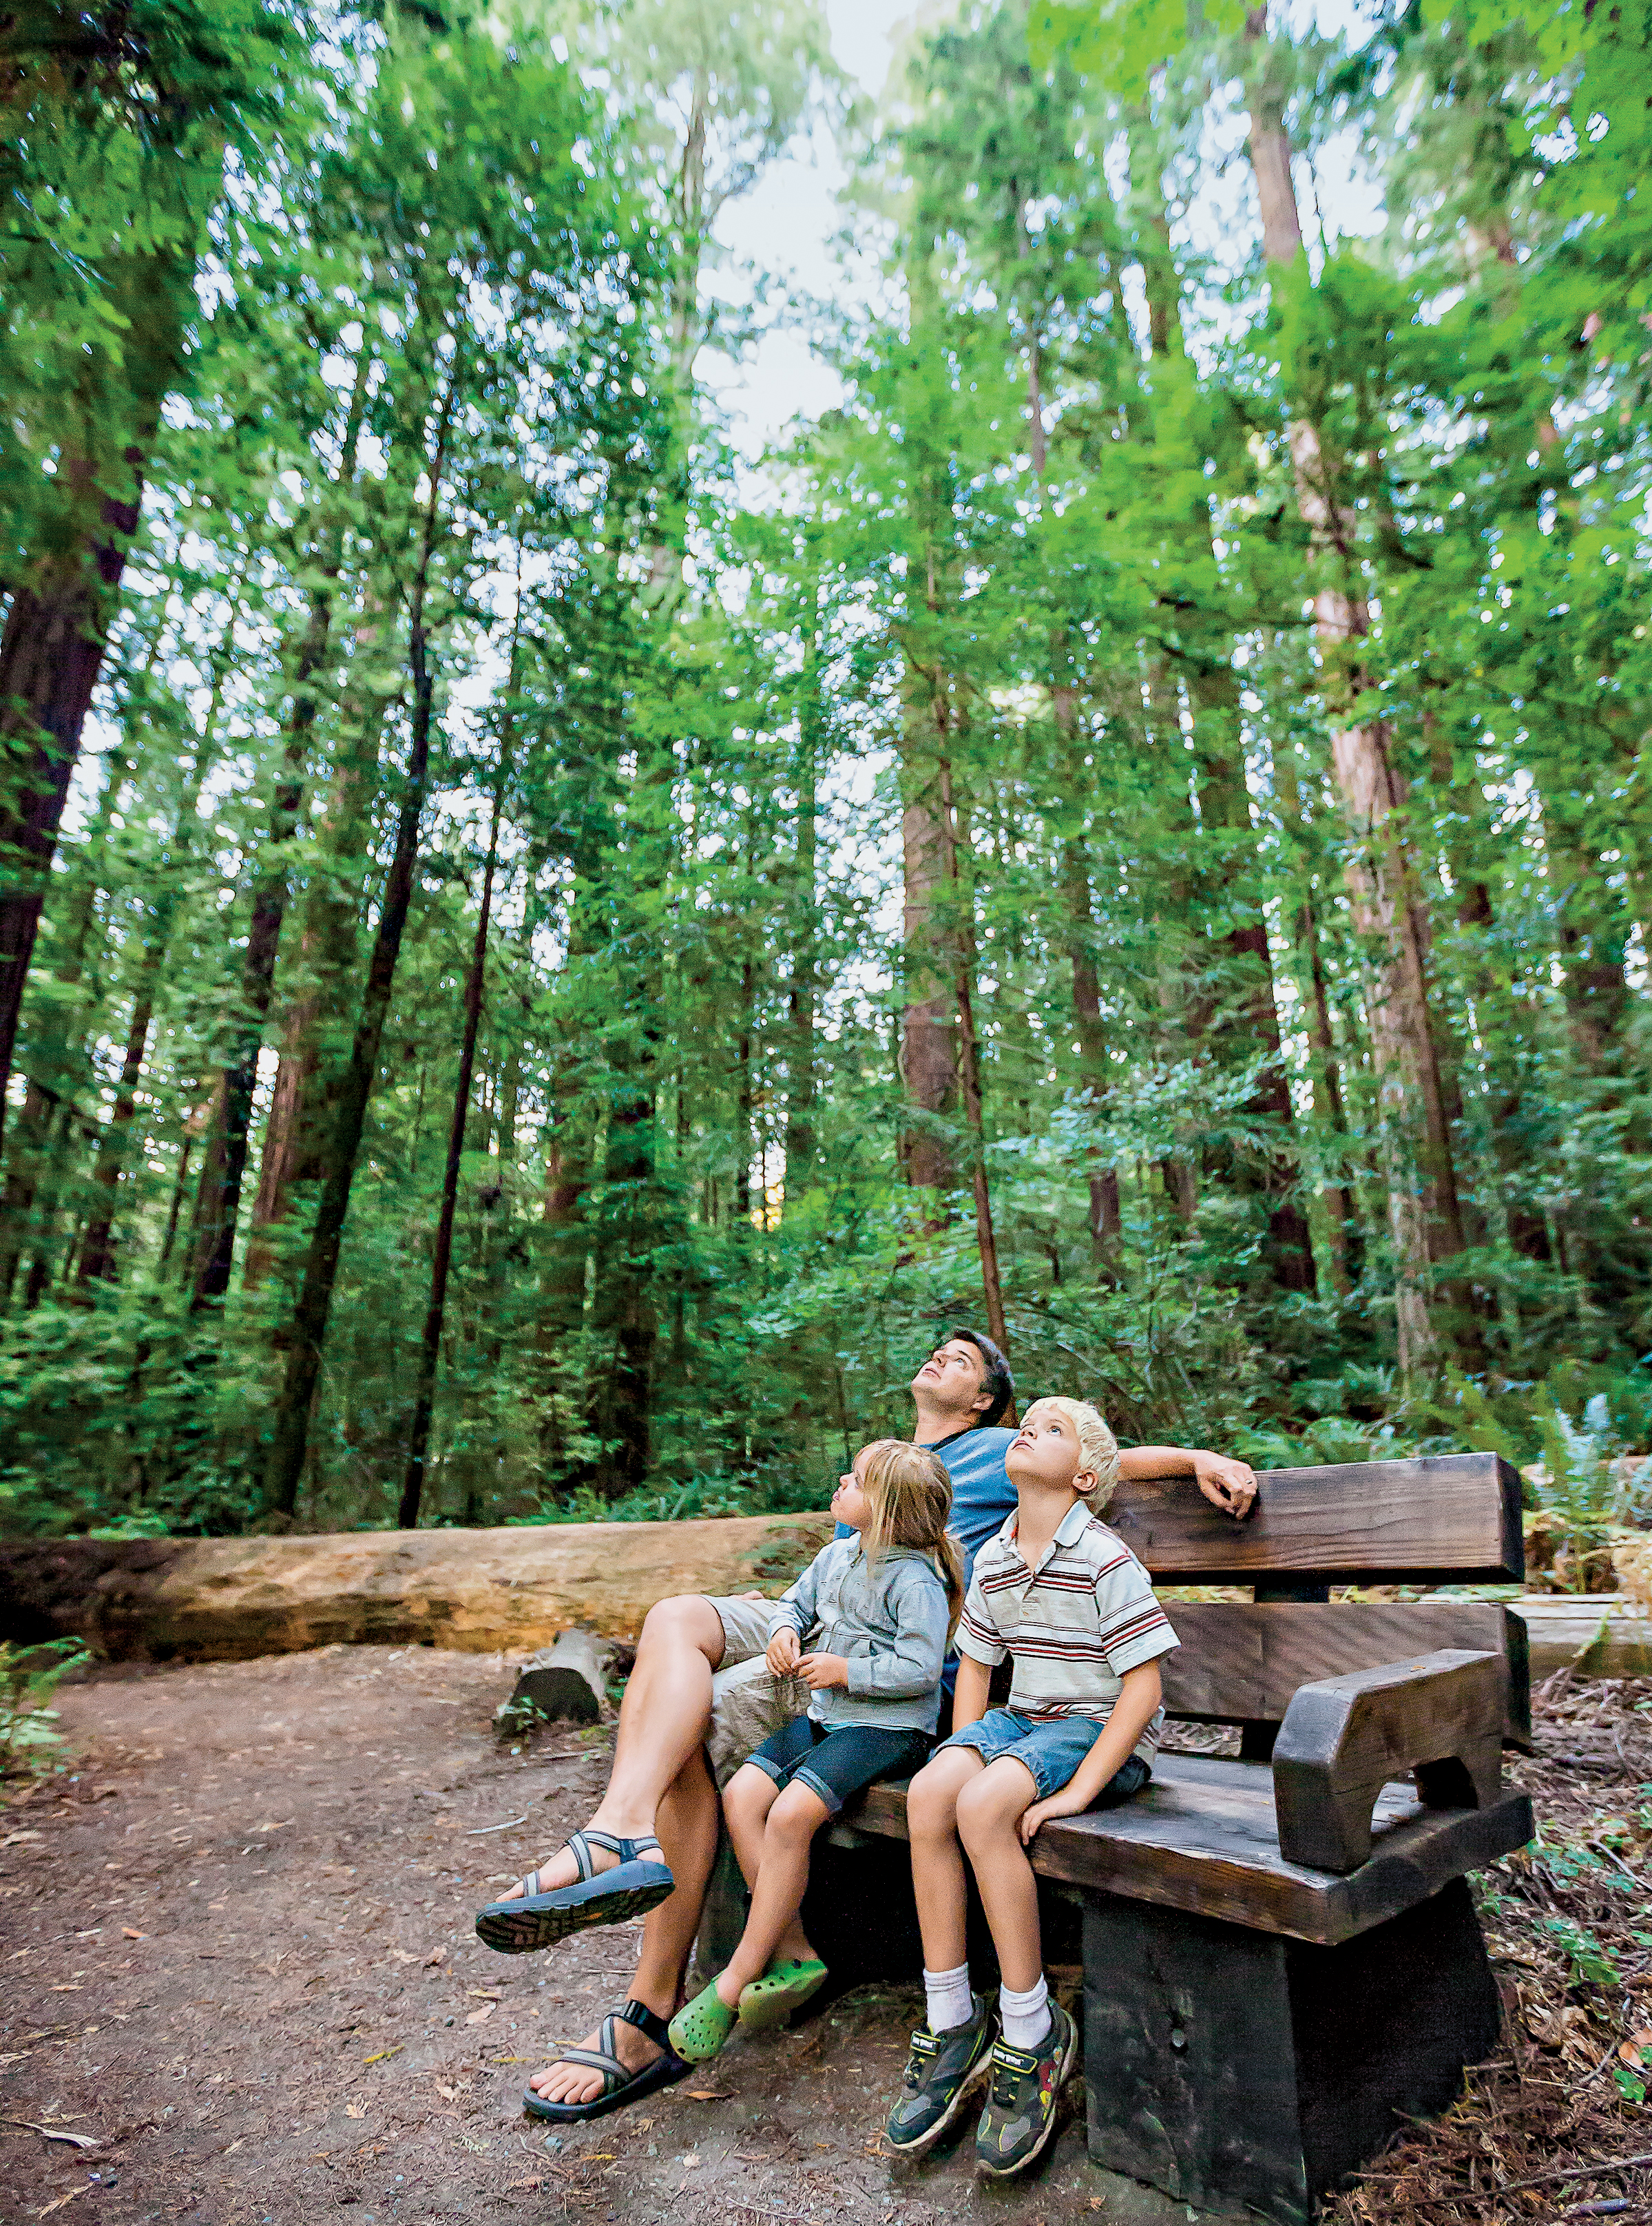 Lessons in Motion · National Parks Conservation Association